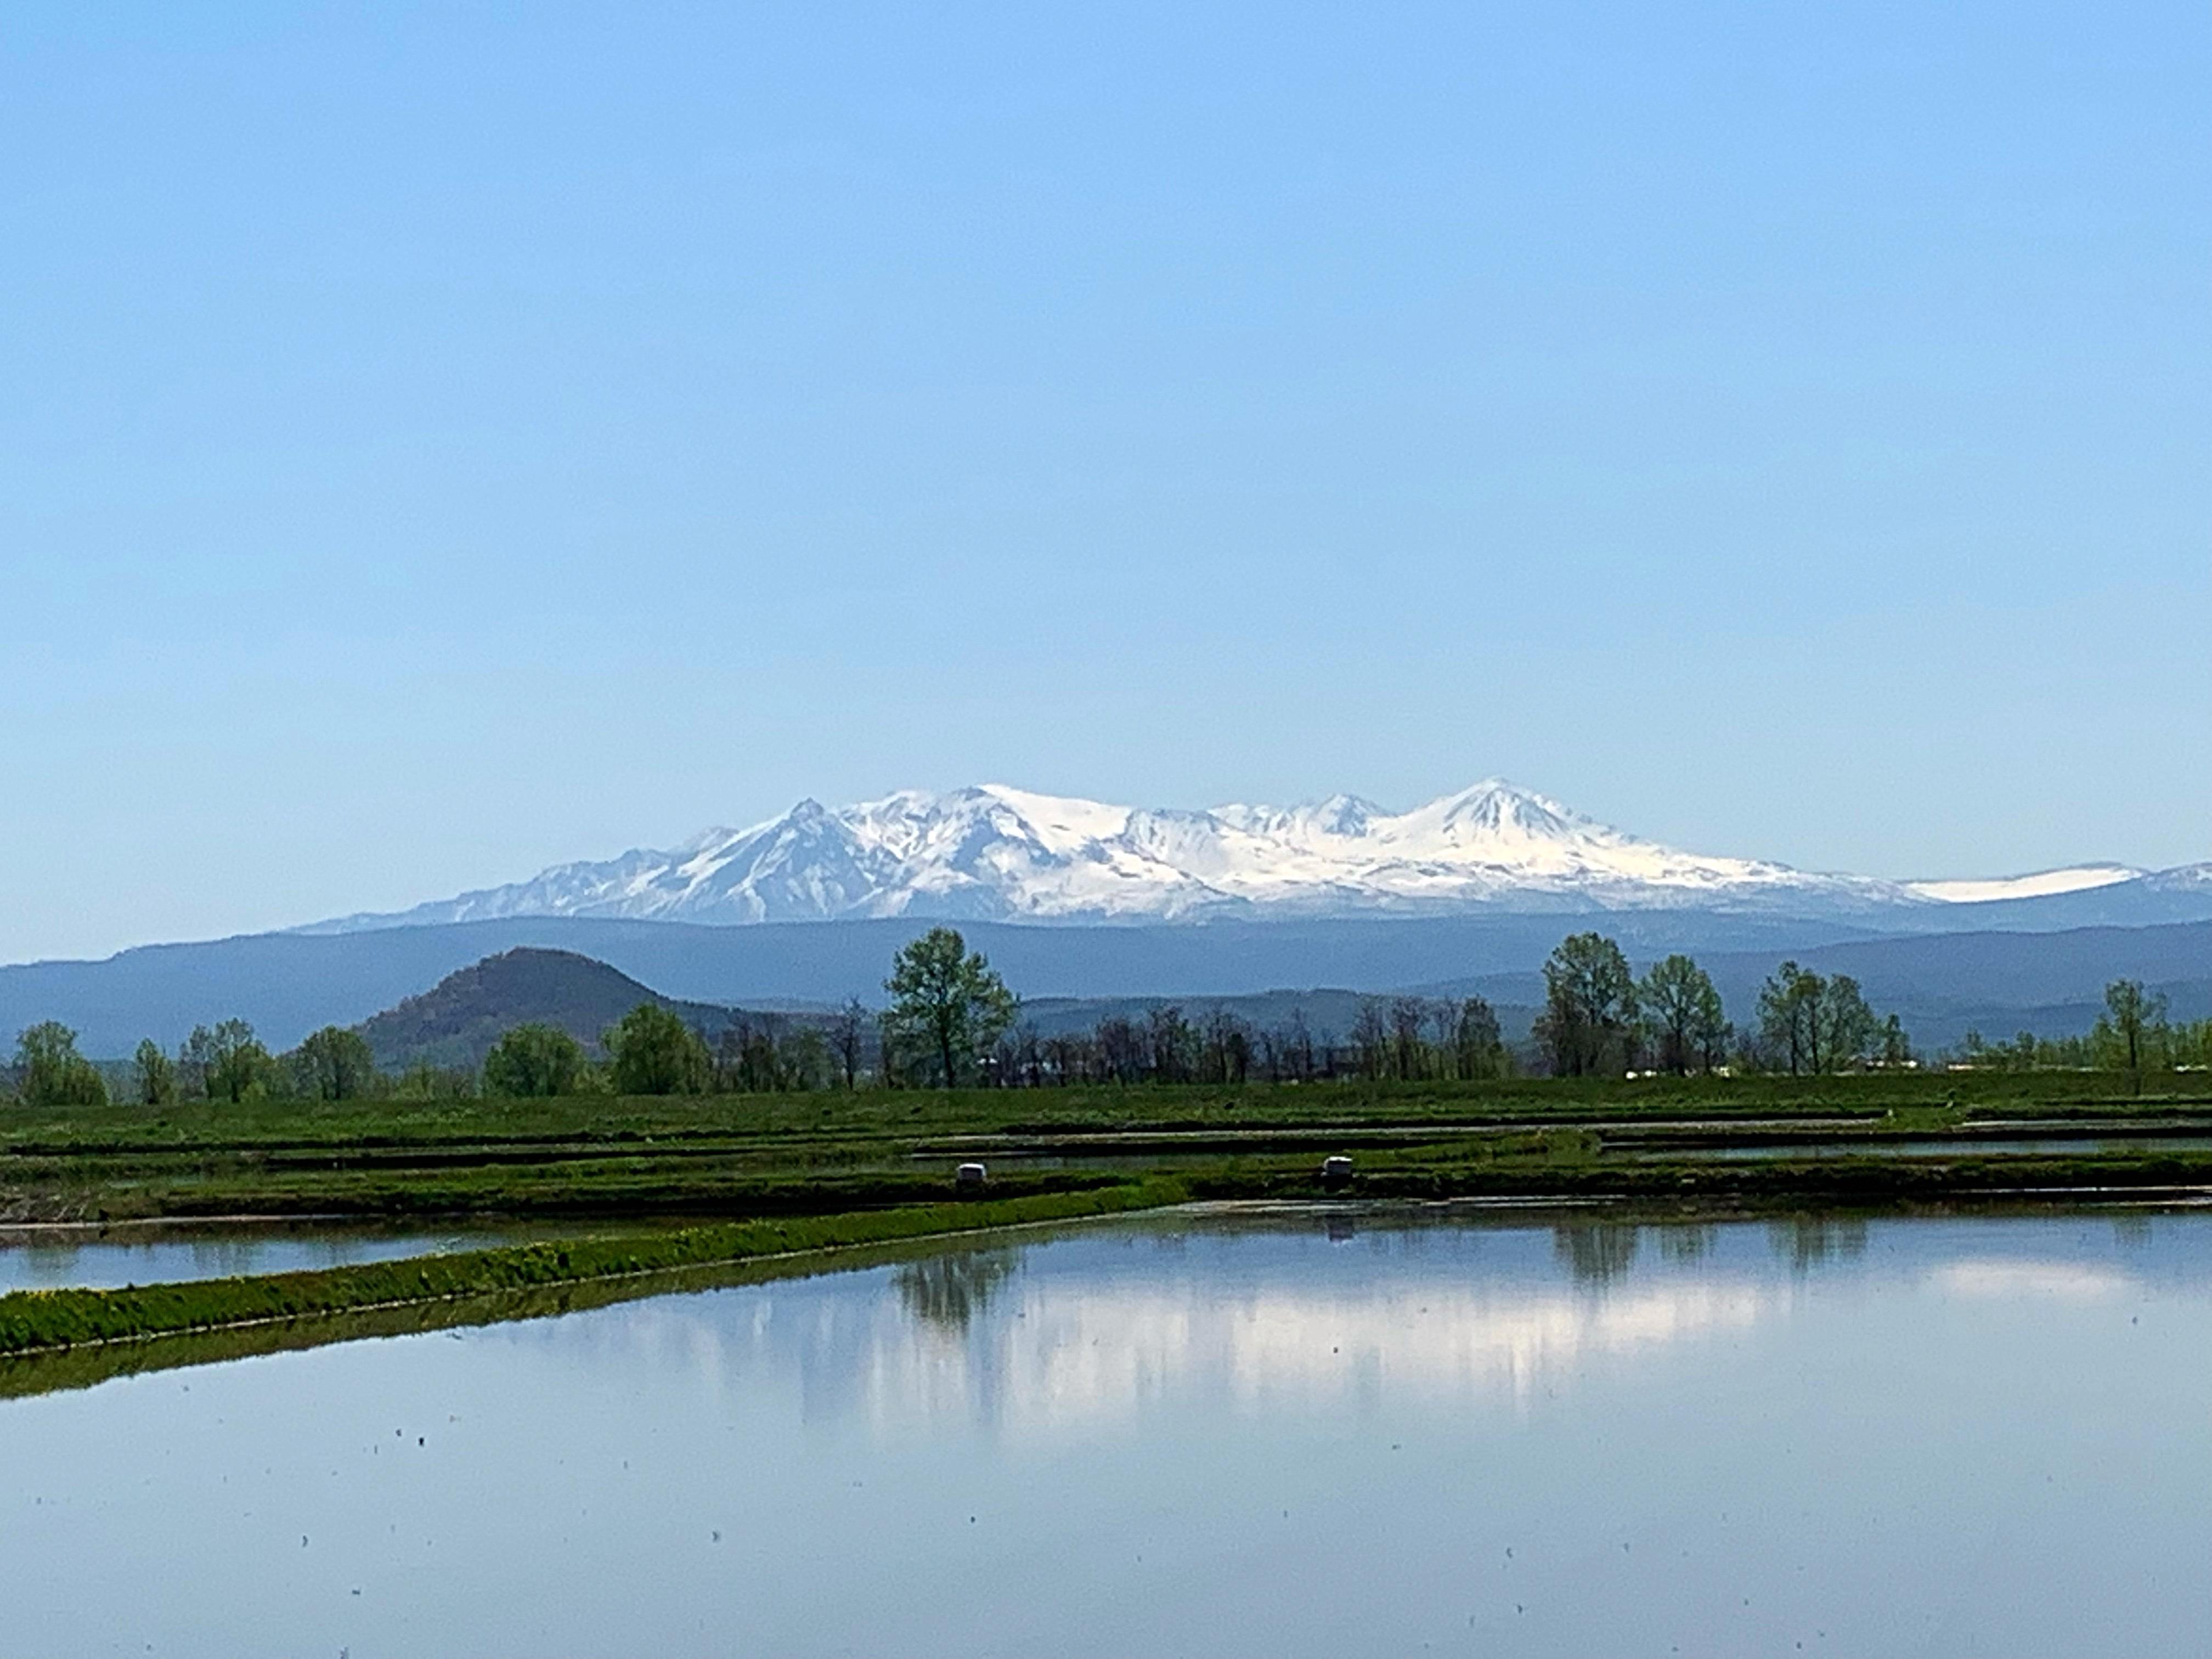 2019.5.14午前10時前の大雪山